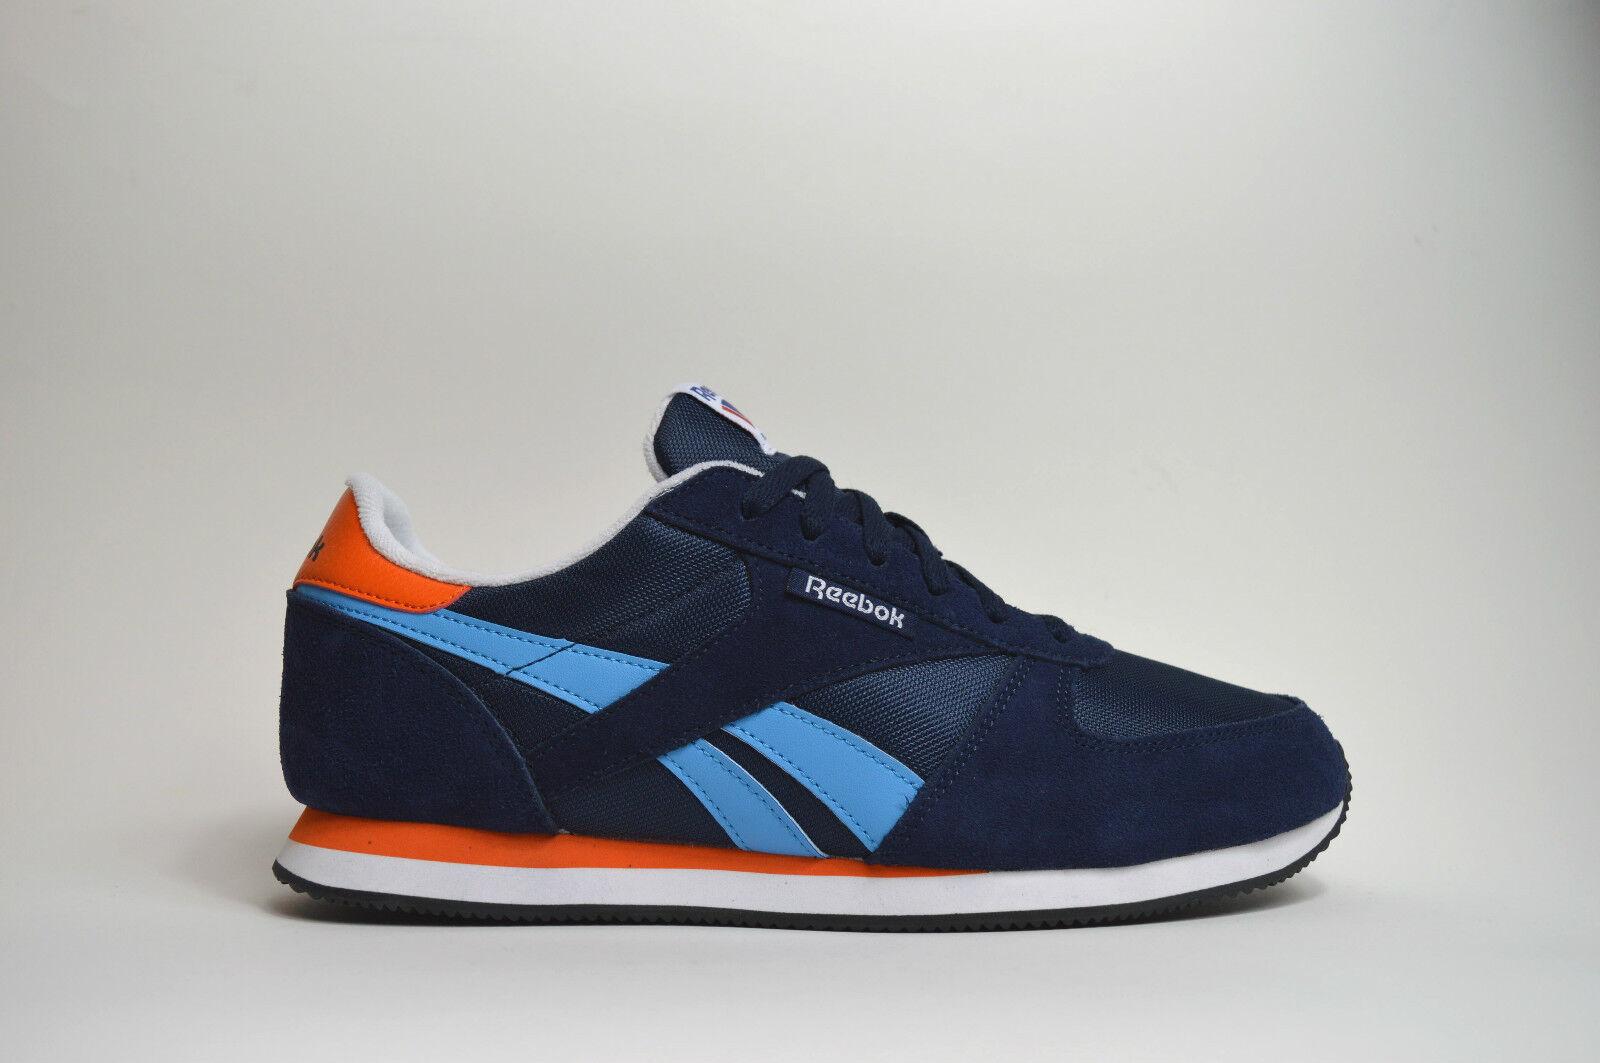 Reebok Royal CL Jogger NEU Retro Vintage Herren Sneaker blau atmos patta max